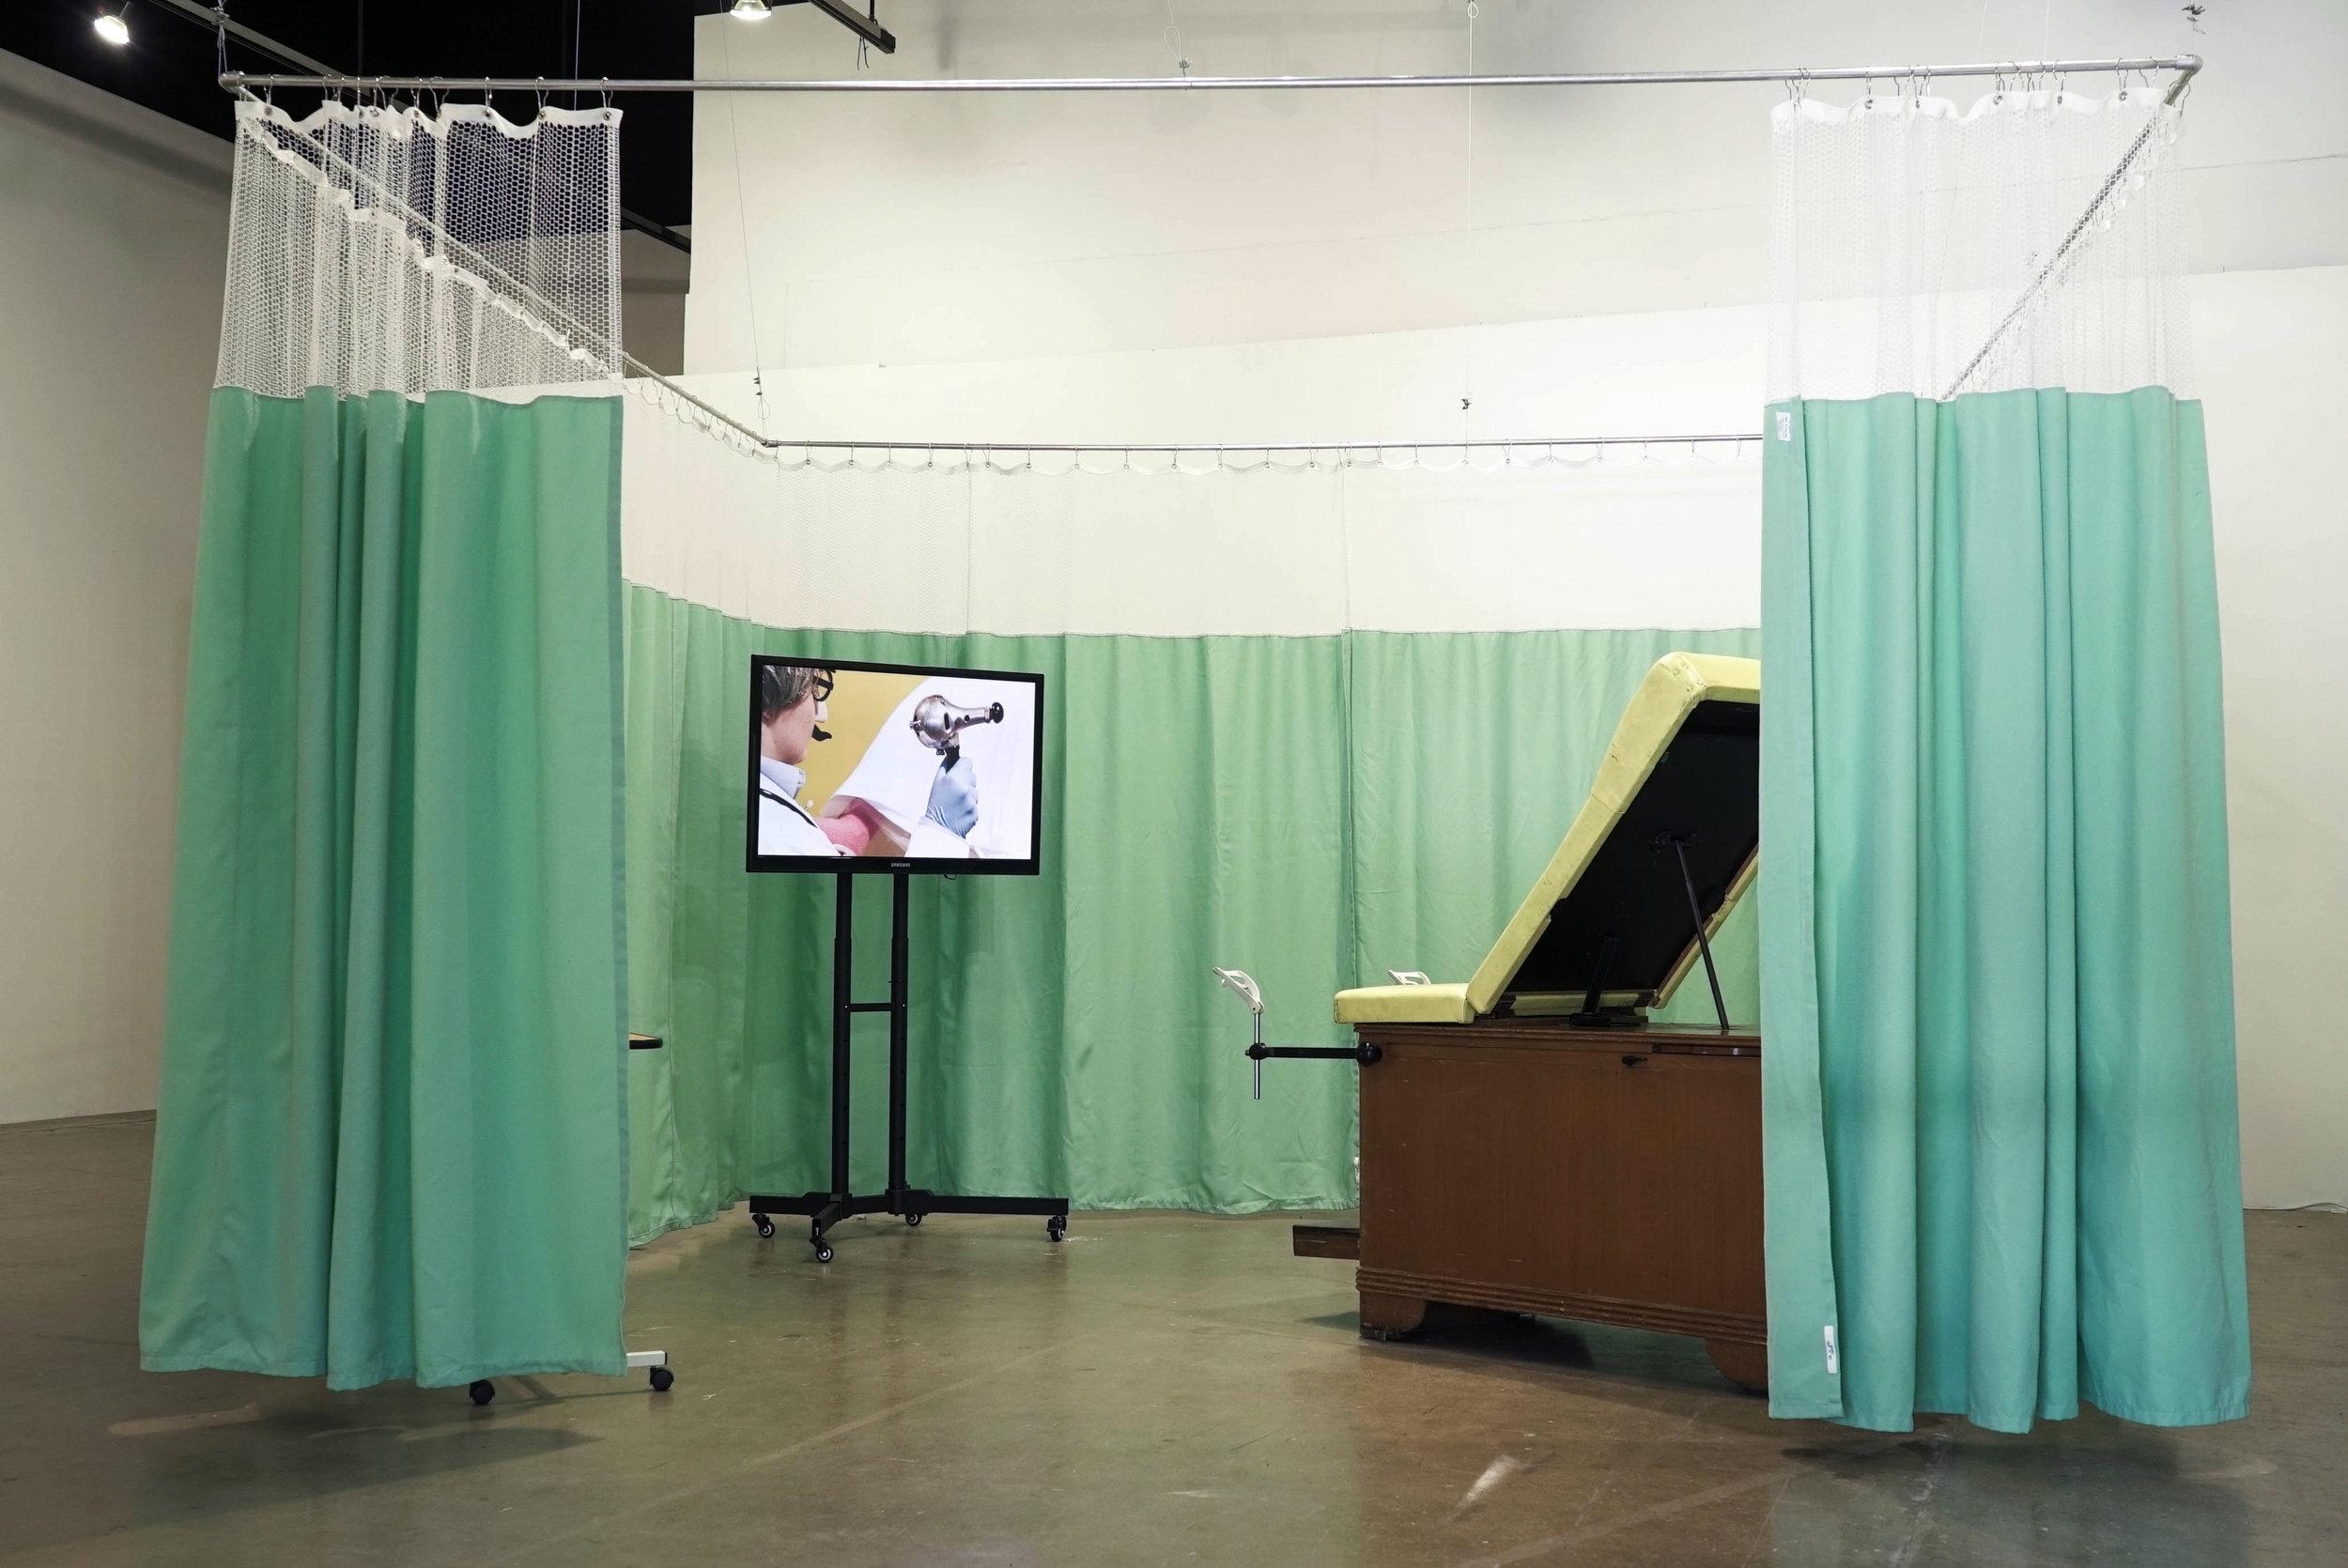 Guggenheim Gallery April 2018